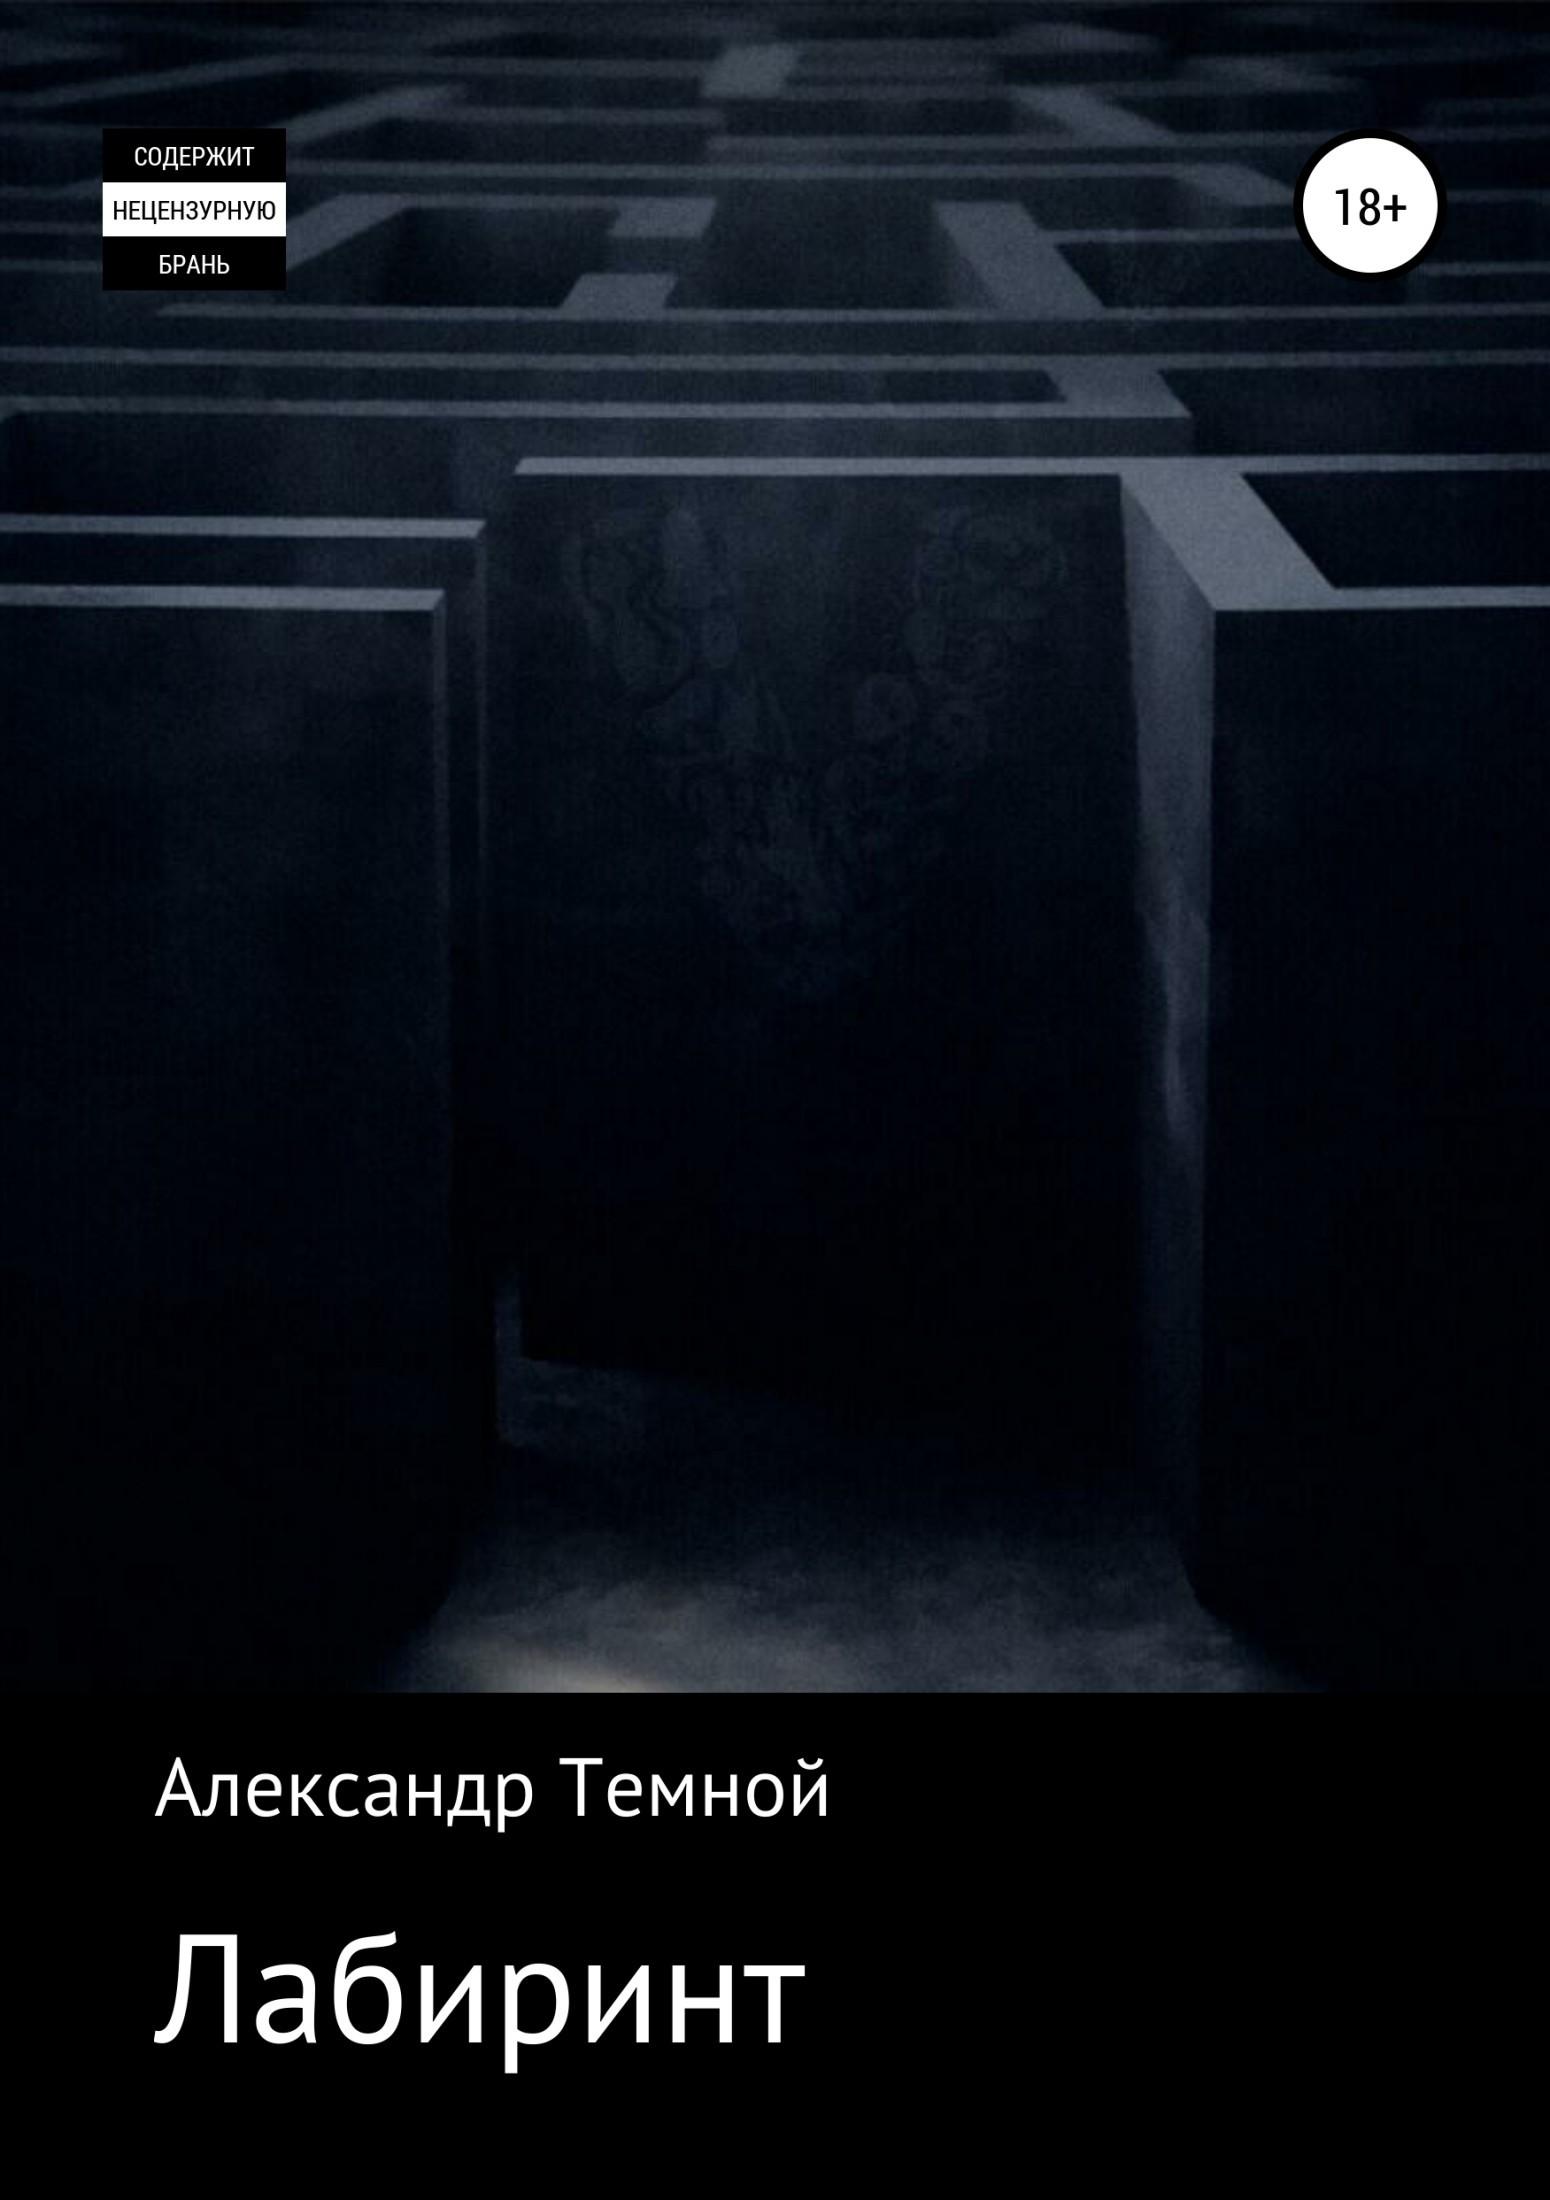 Александр Валерьевич Темной Лабиринт забусов александр владимирович лабиринт войти в ту же реку